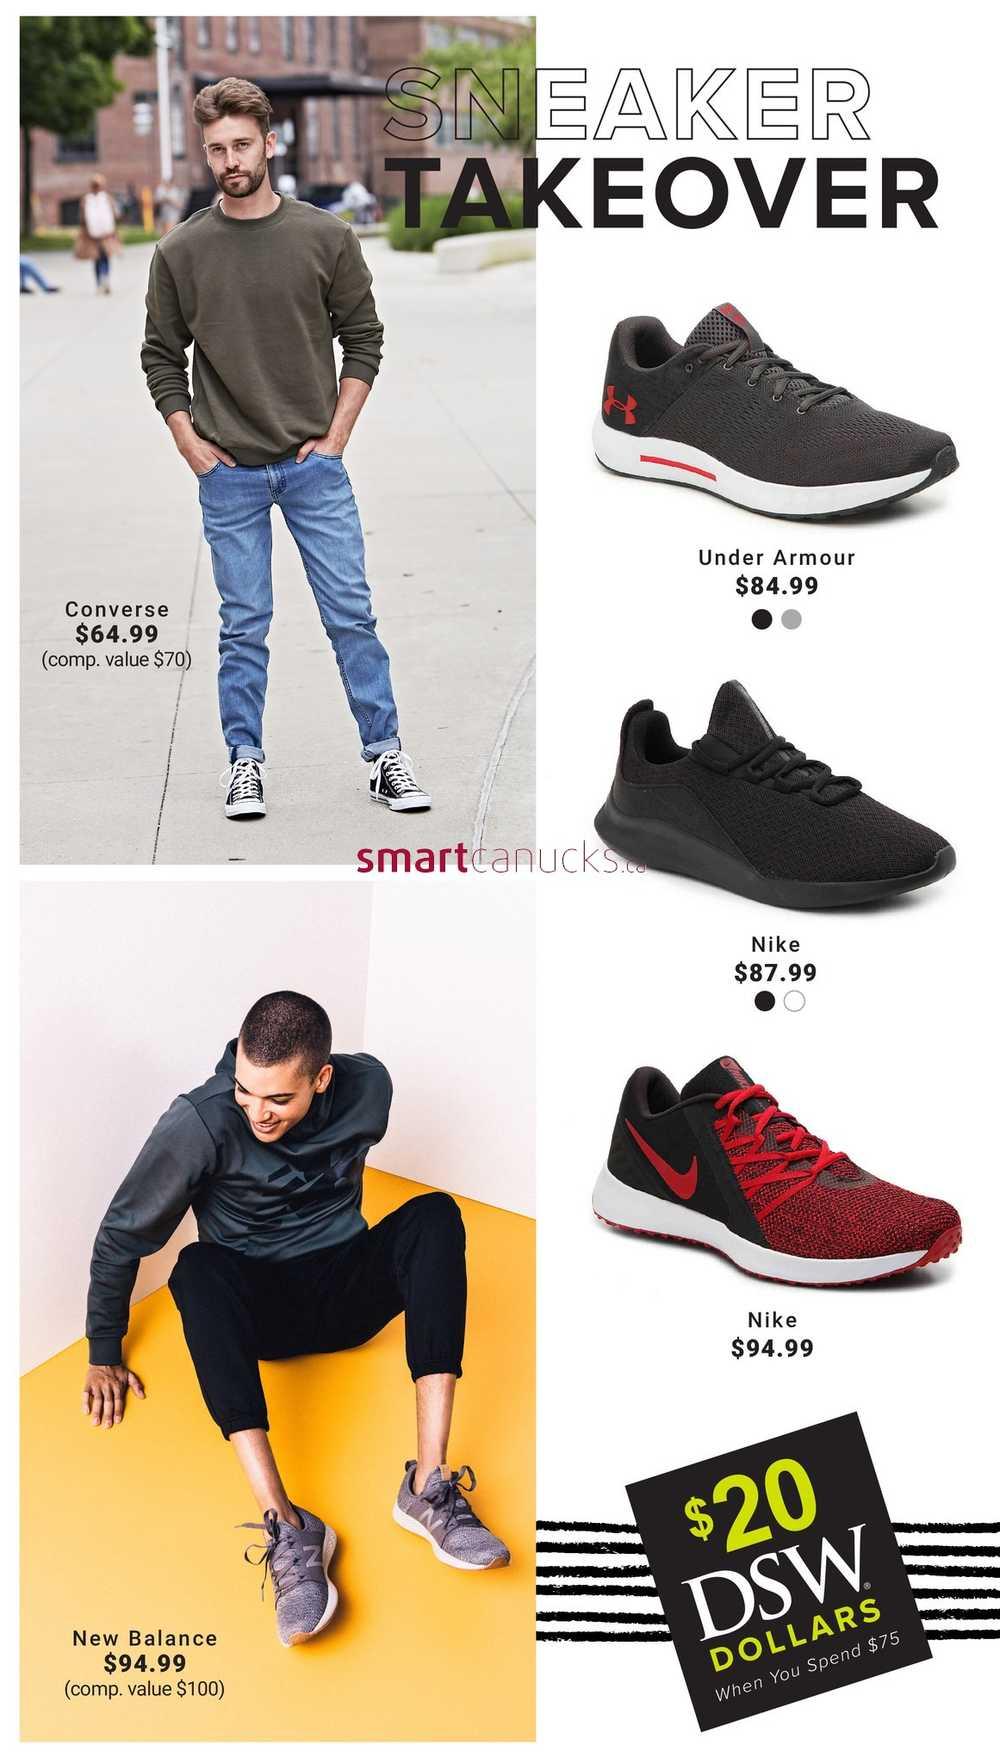 347c85468740fd DSW Designer Shoe Warehouse Flyer September 14 to 21